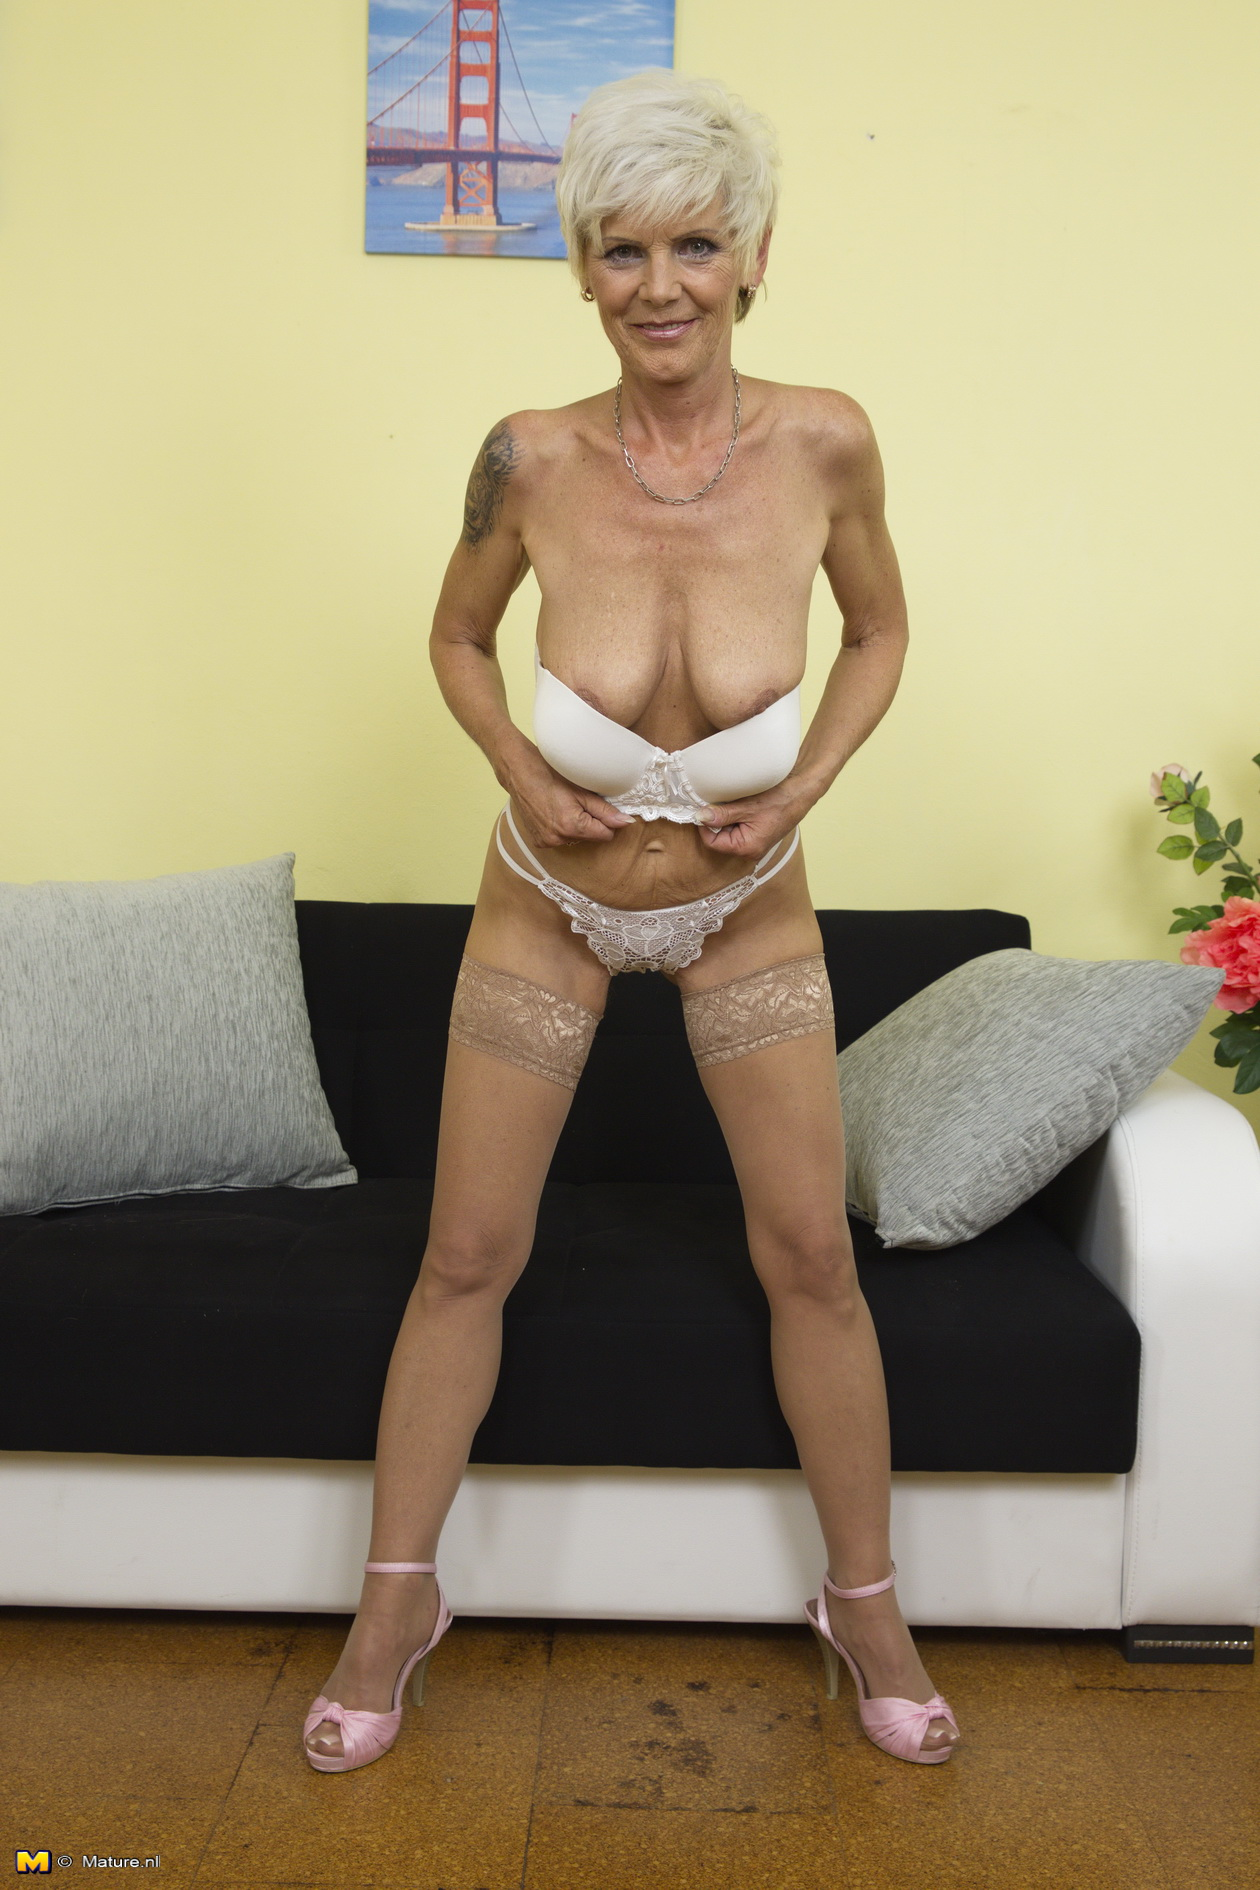 Nude wife voyeur sex